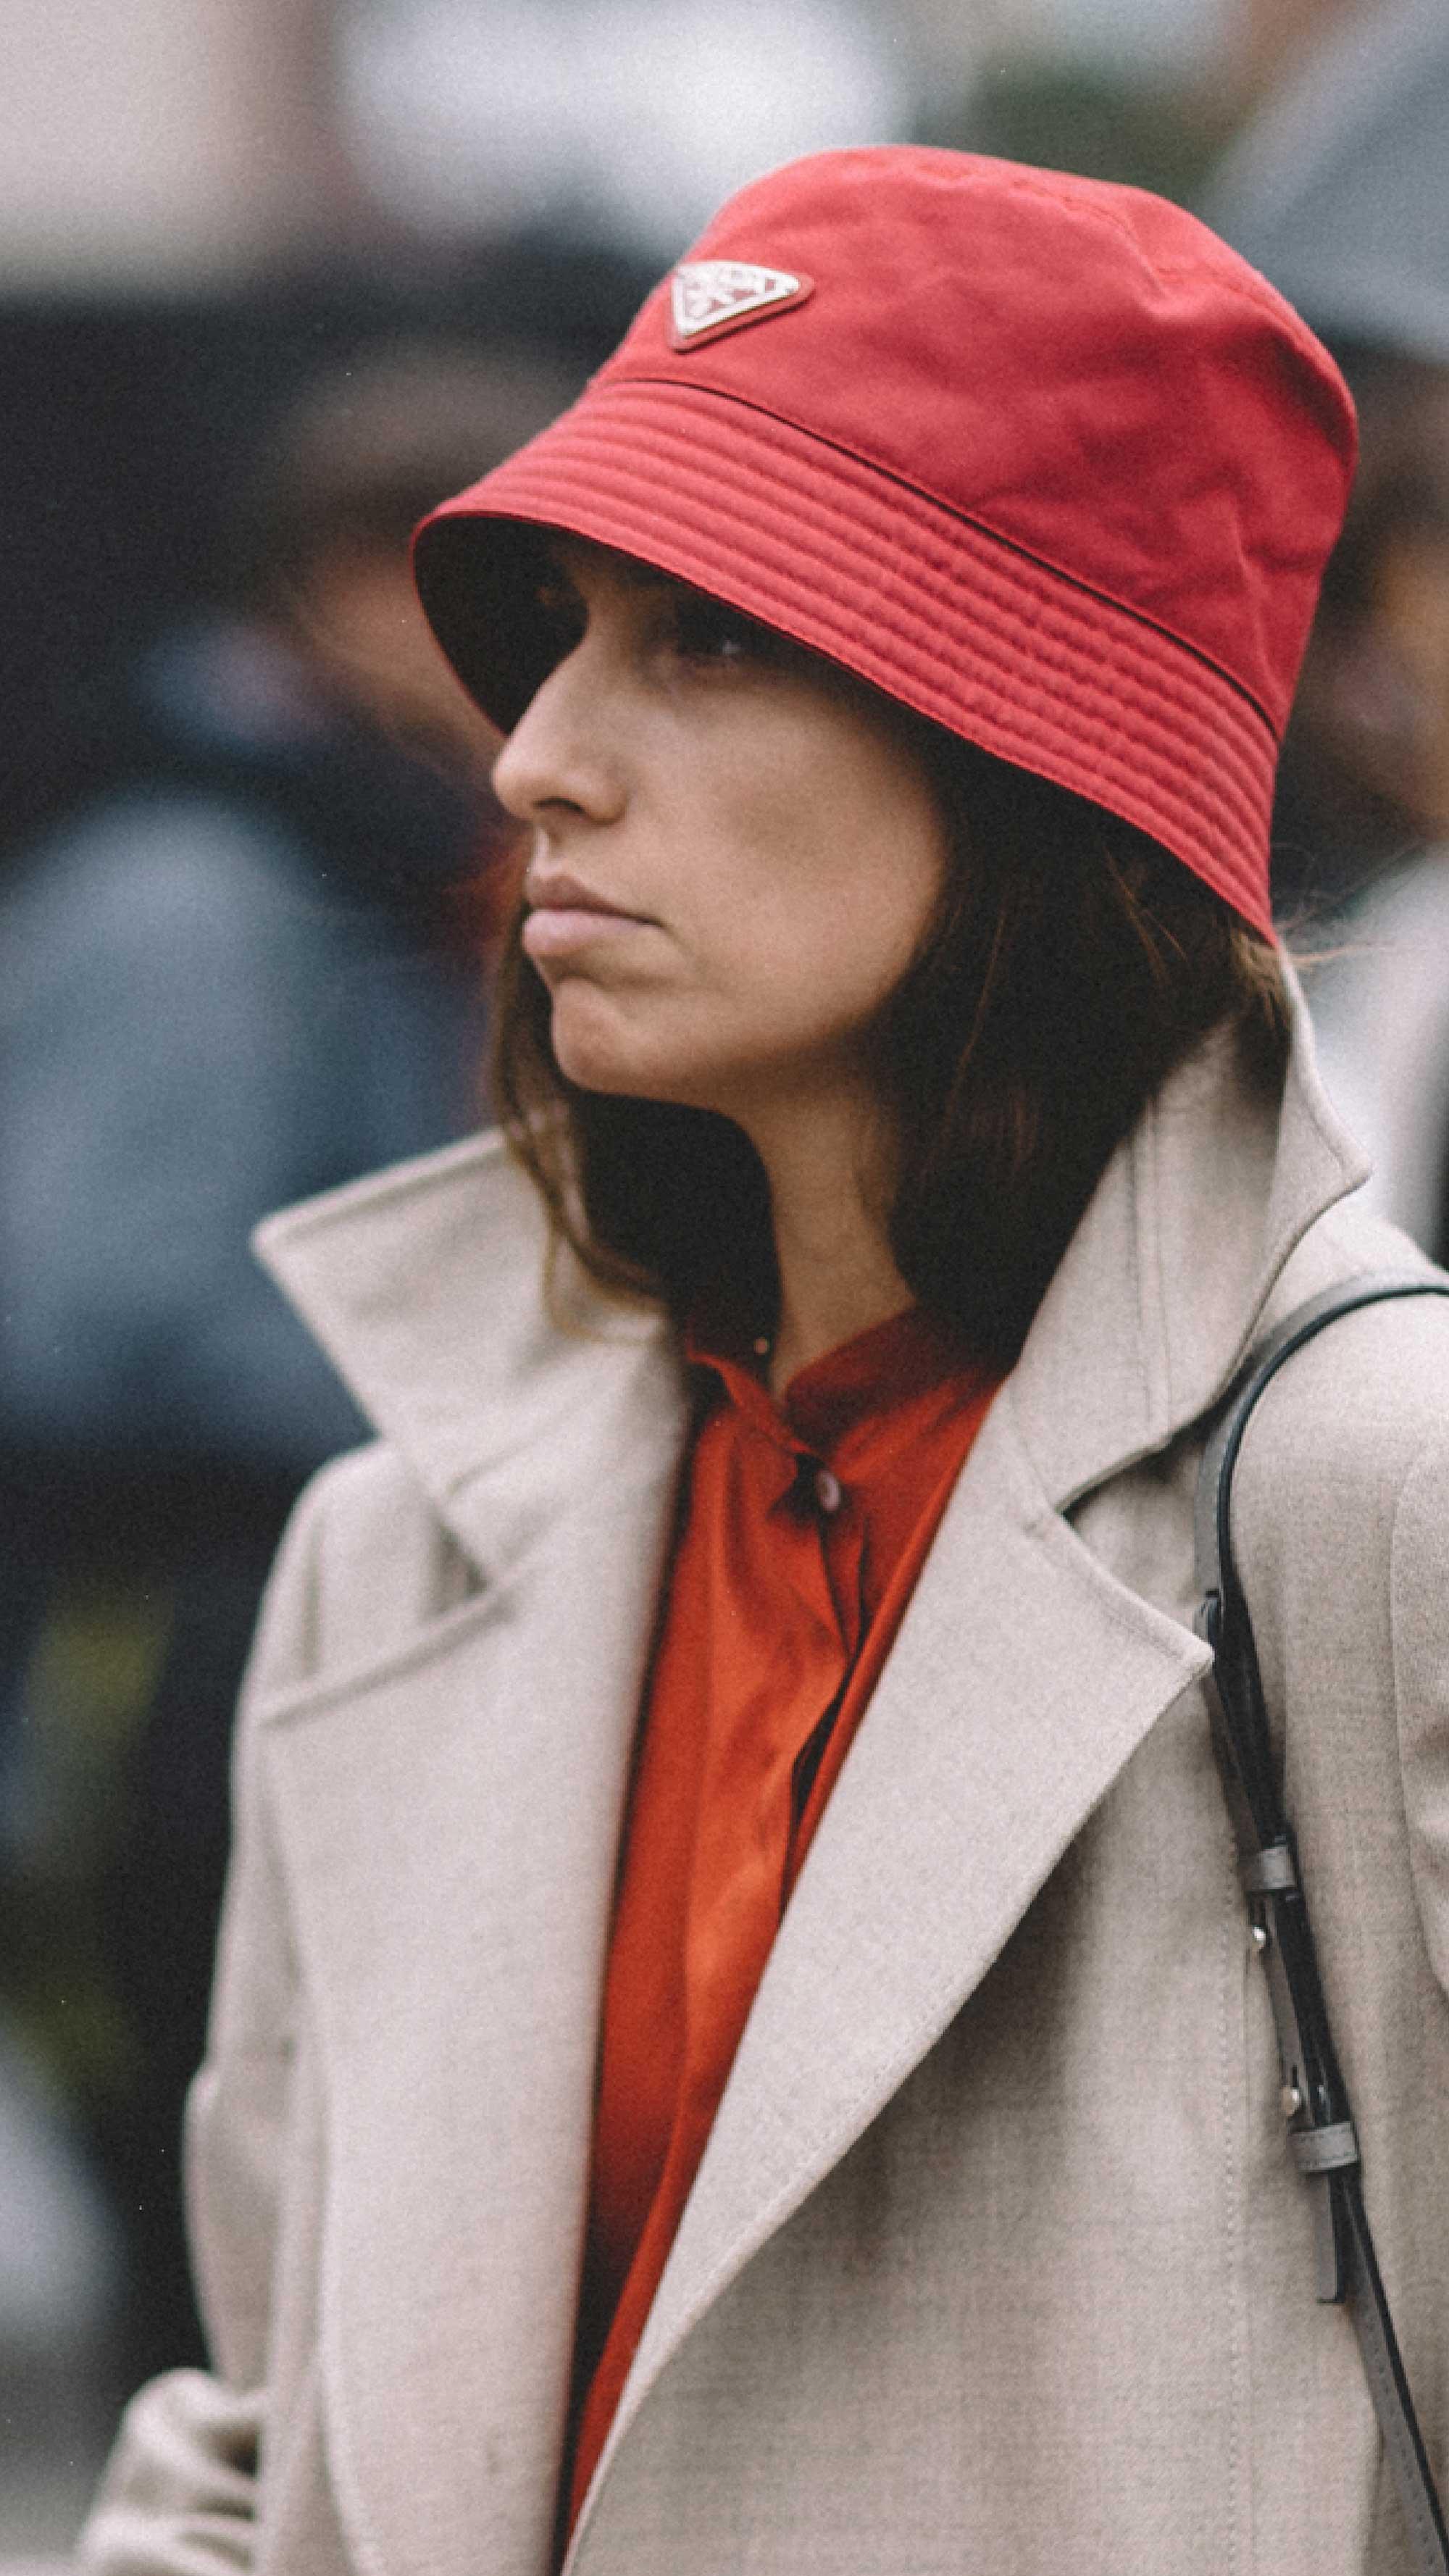 New-York-Fashion-Week-NYFW-SS18-street-style-day-five-SS1835.jpg